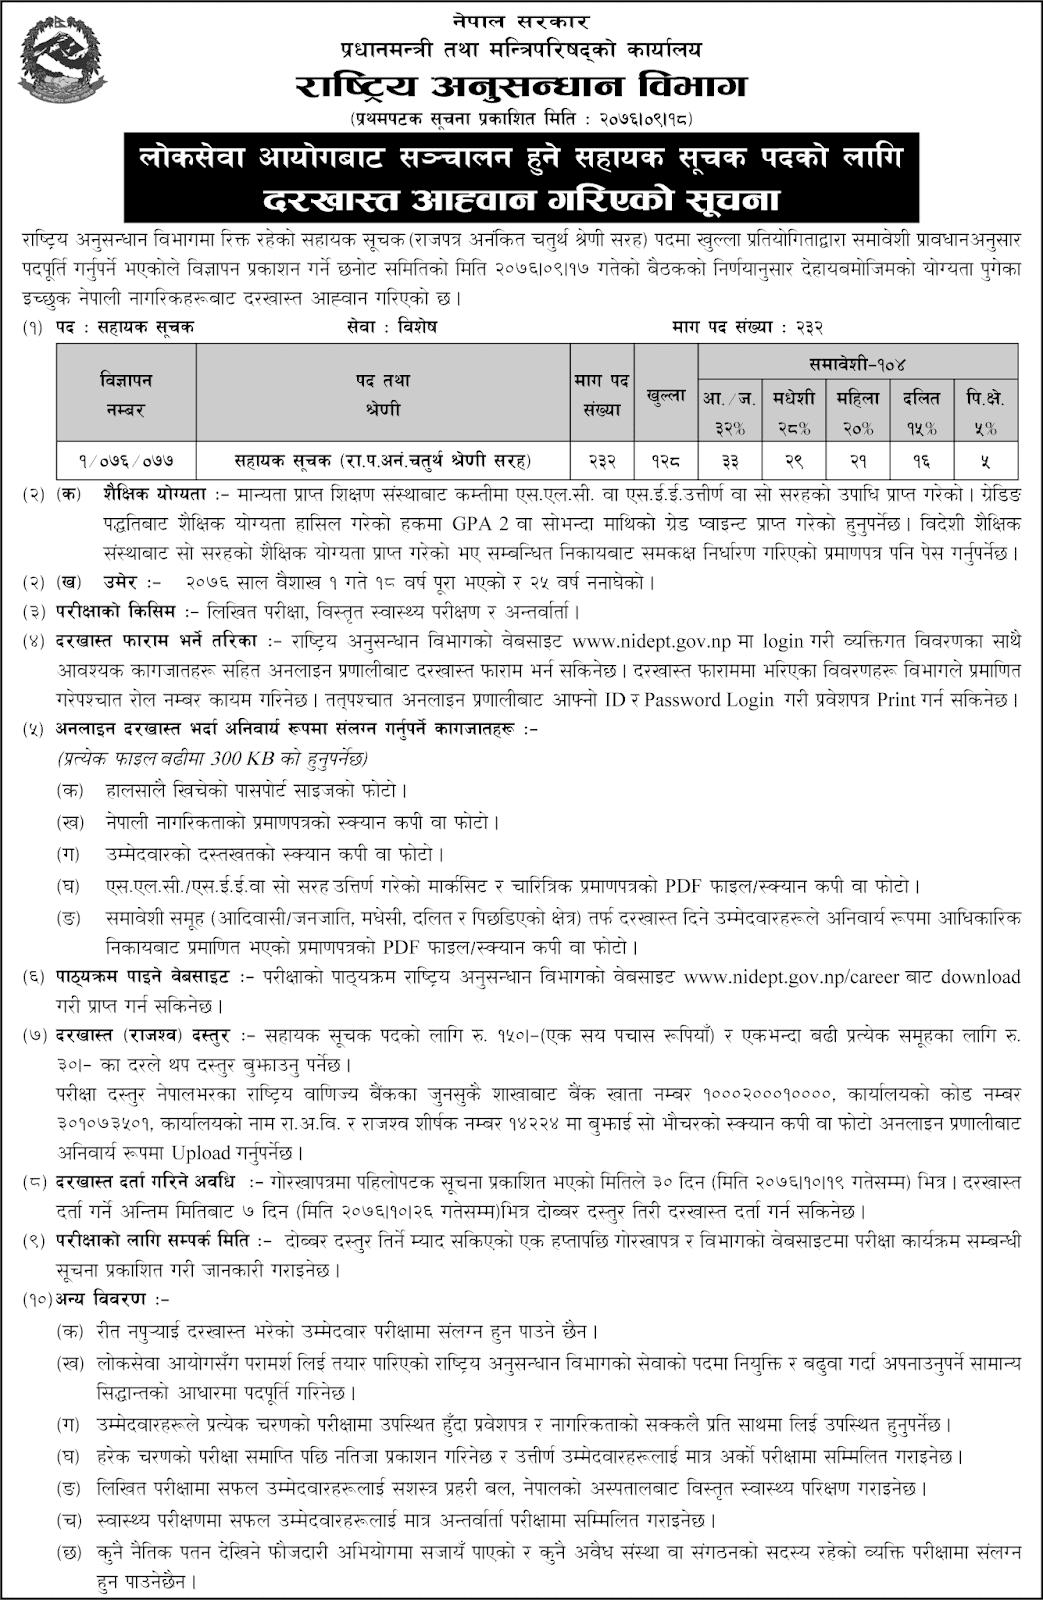 Rastriya Anusandhan Bibhag Vacancy Notice for Sahayak Suchak